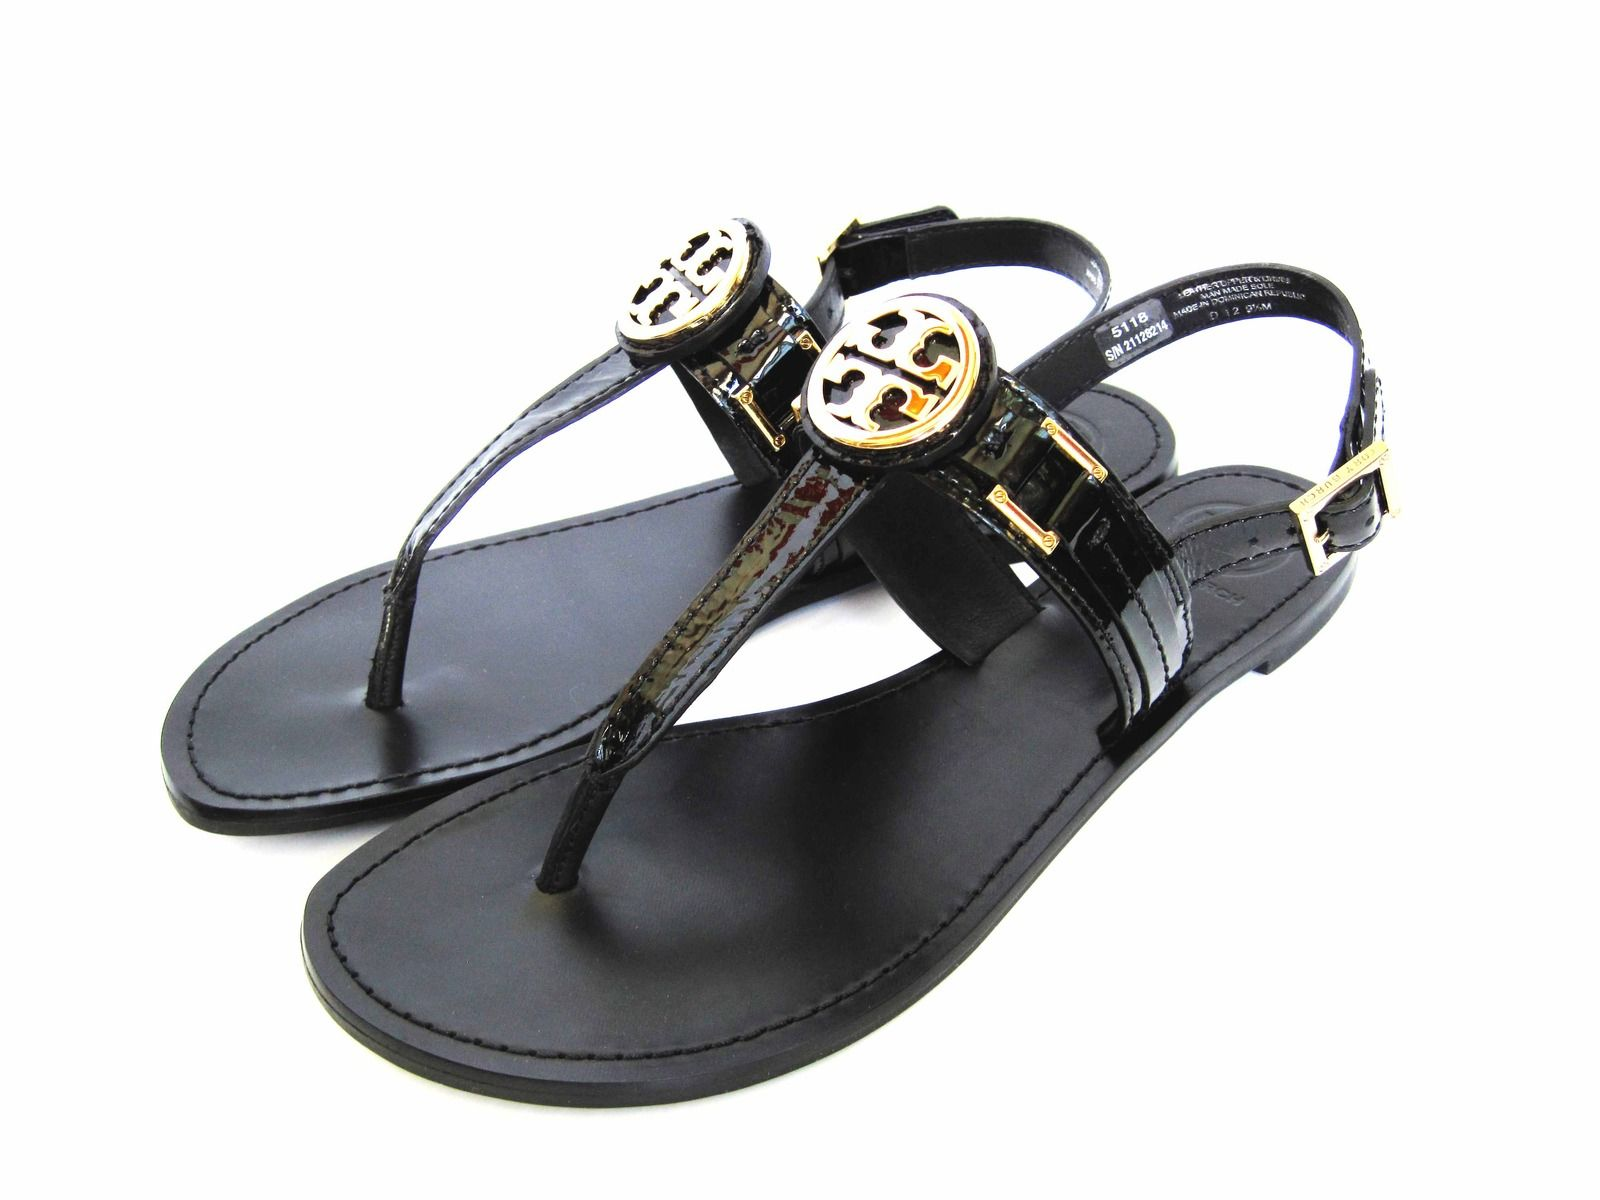 Tory Burch Patent Cassia Gold Logo Sandal Black 10.5